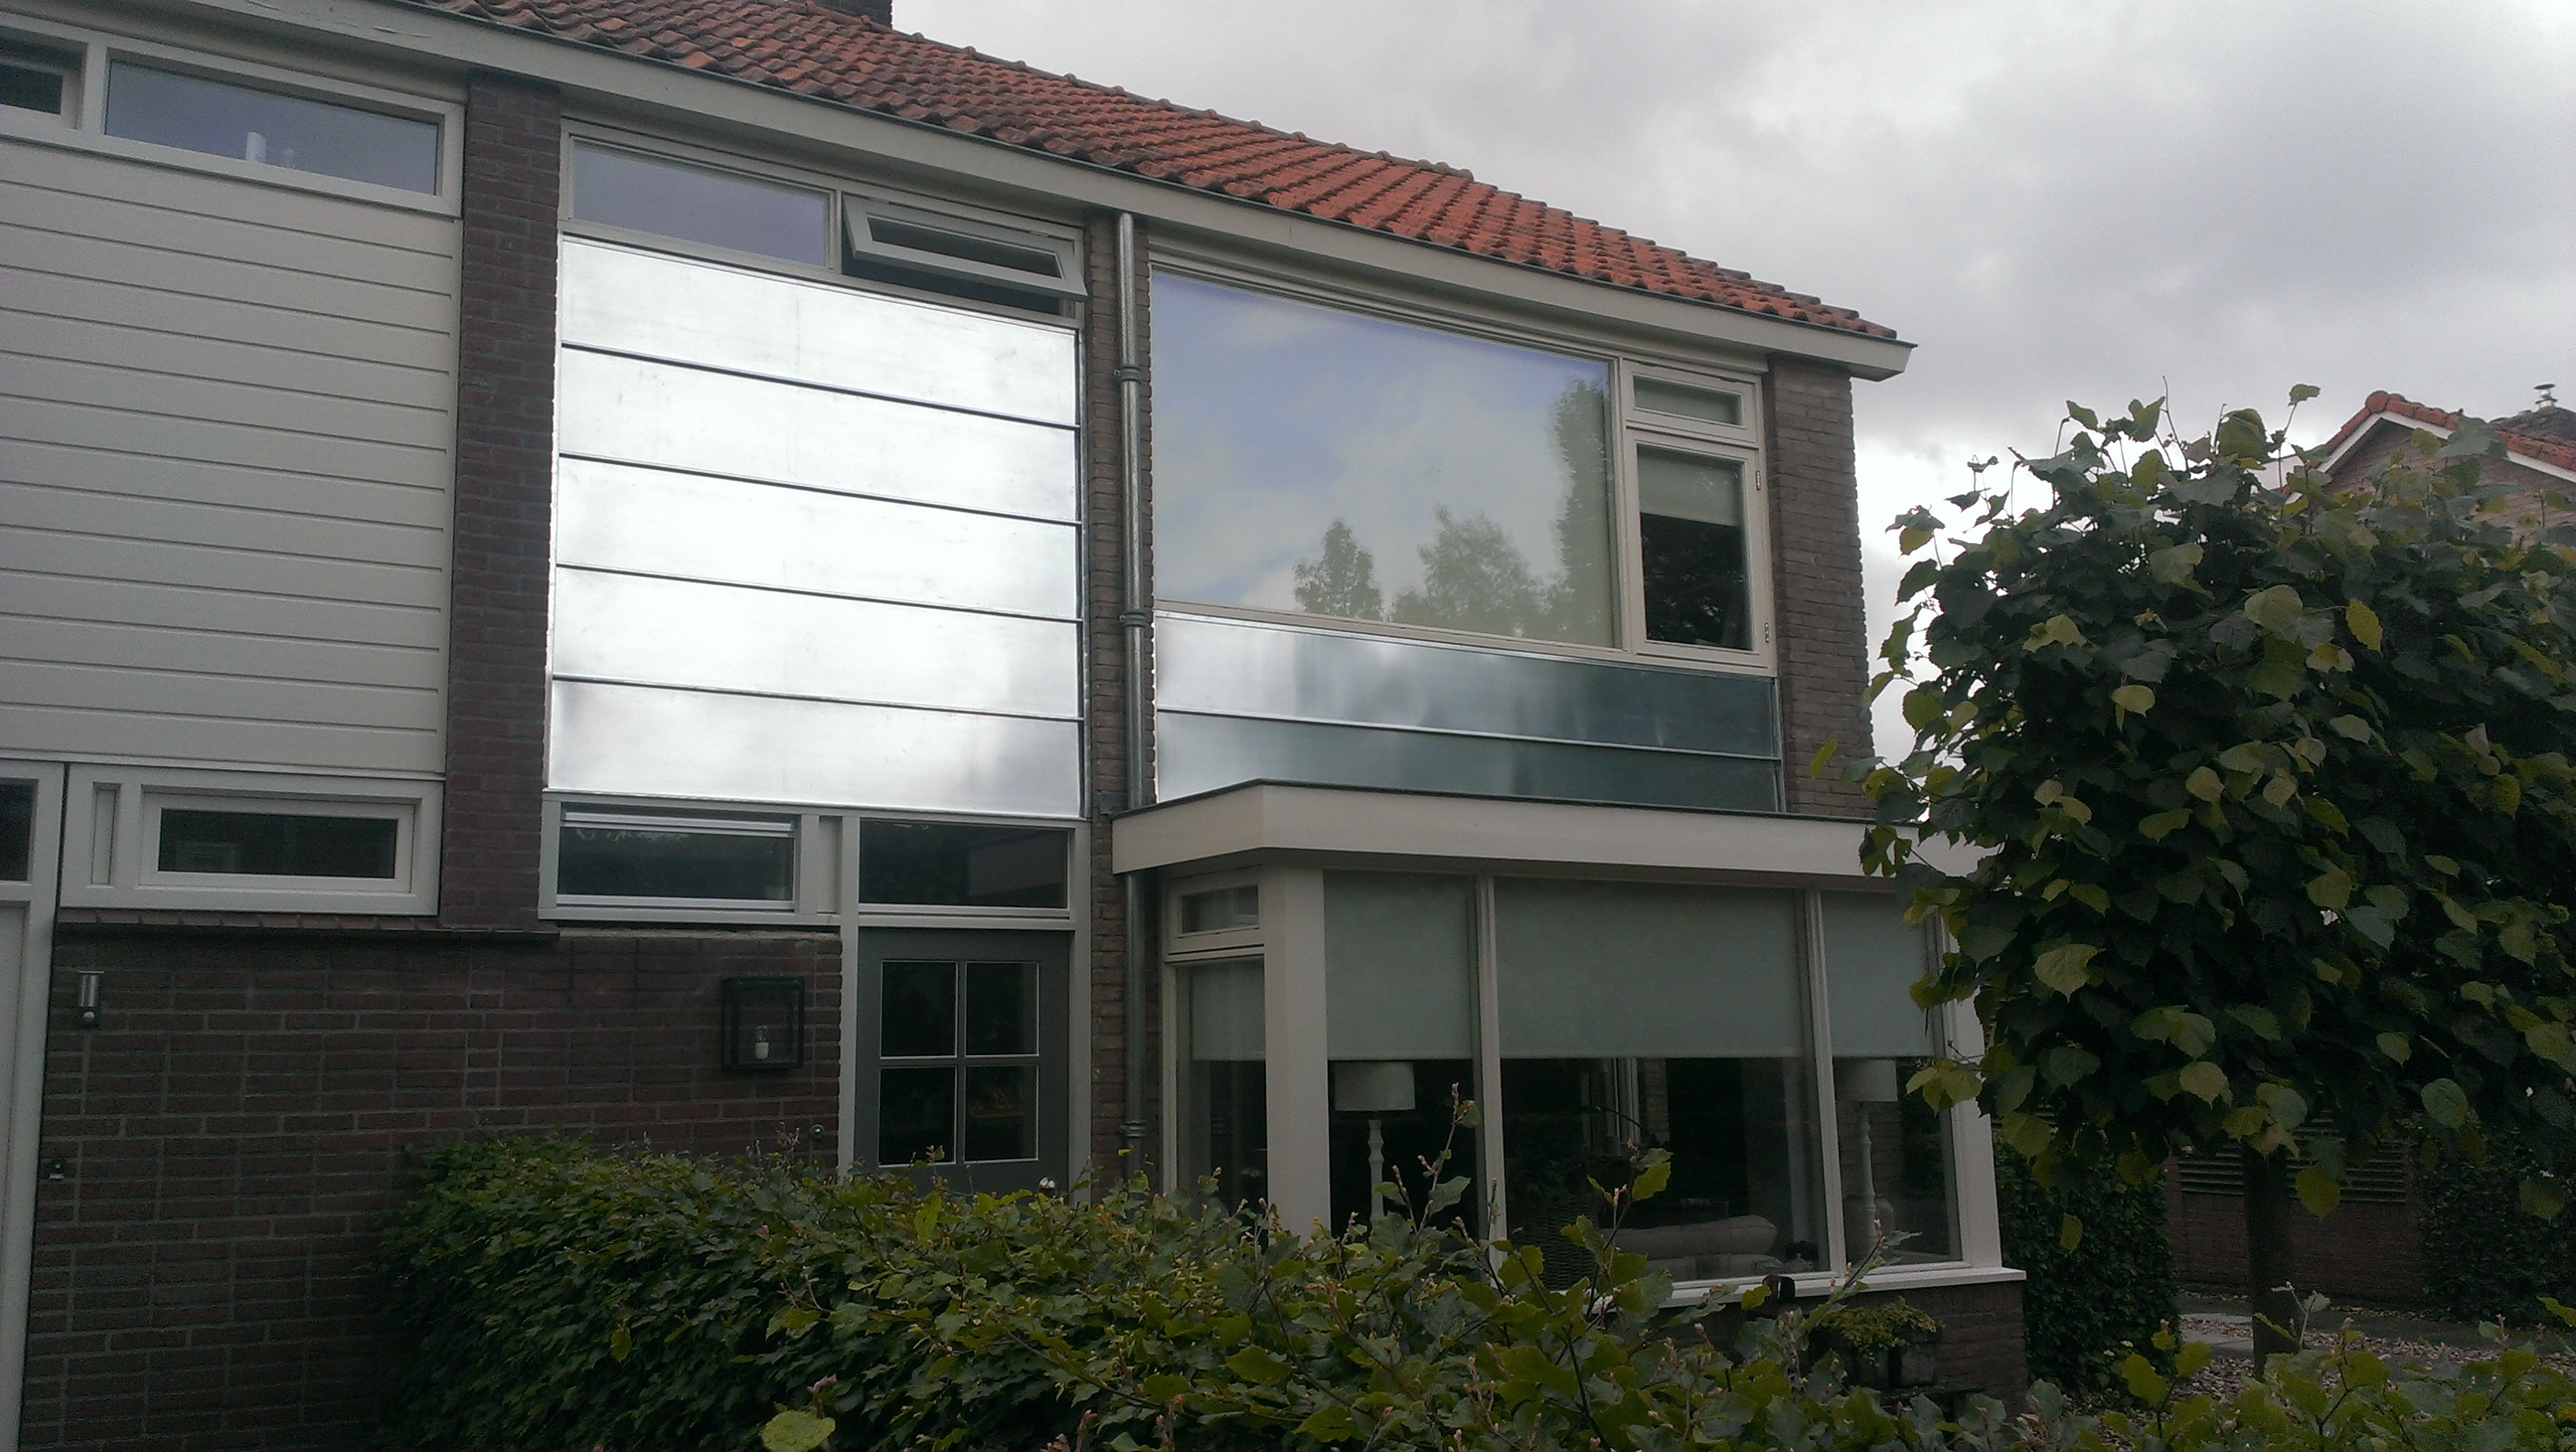 Gevel bekleed met zink, Barneveld juni 2014